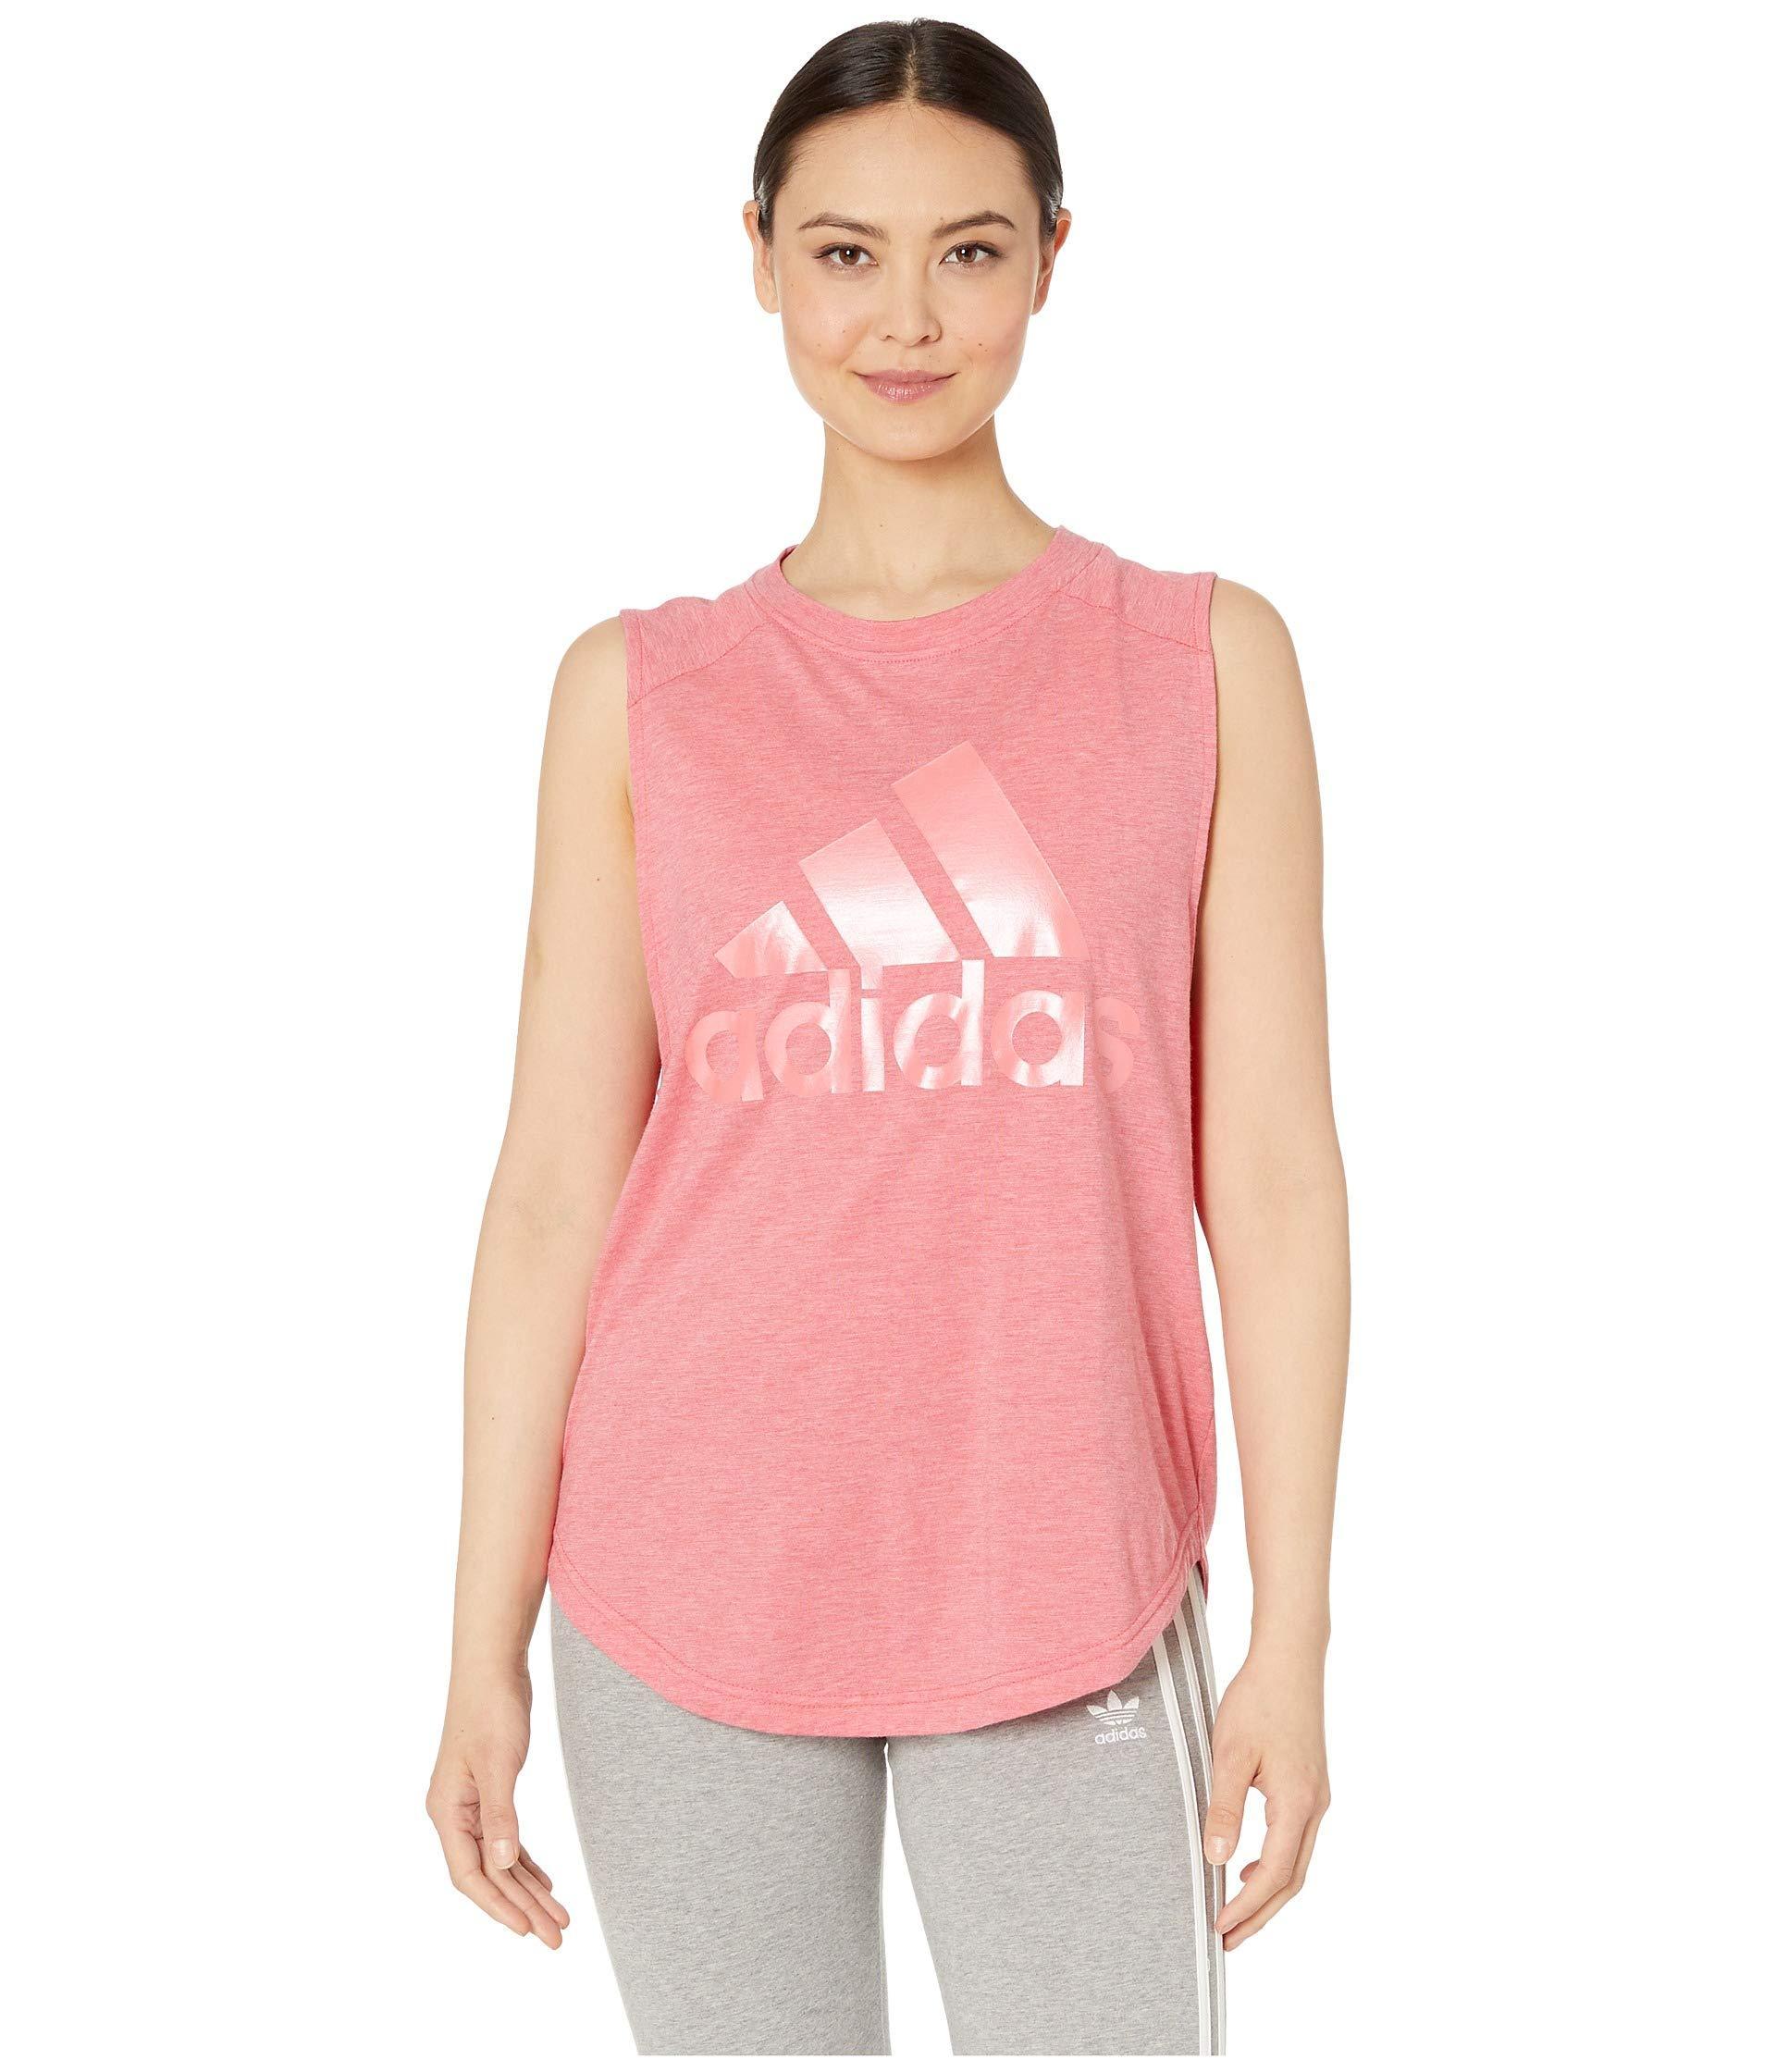 36e8a49ae39f14 Adidas - Pink Winners Id Muscle Tank (ash Grey legend Ink) Women s  Sleeveless. View fullscreen